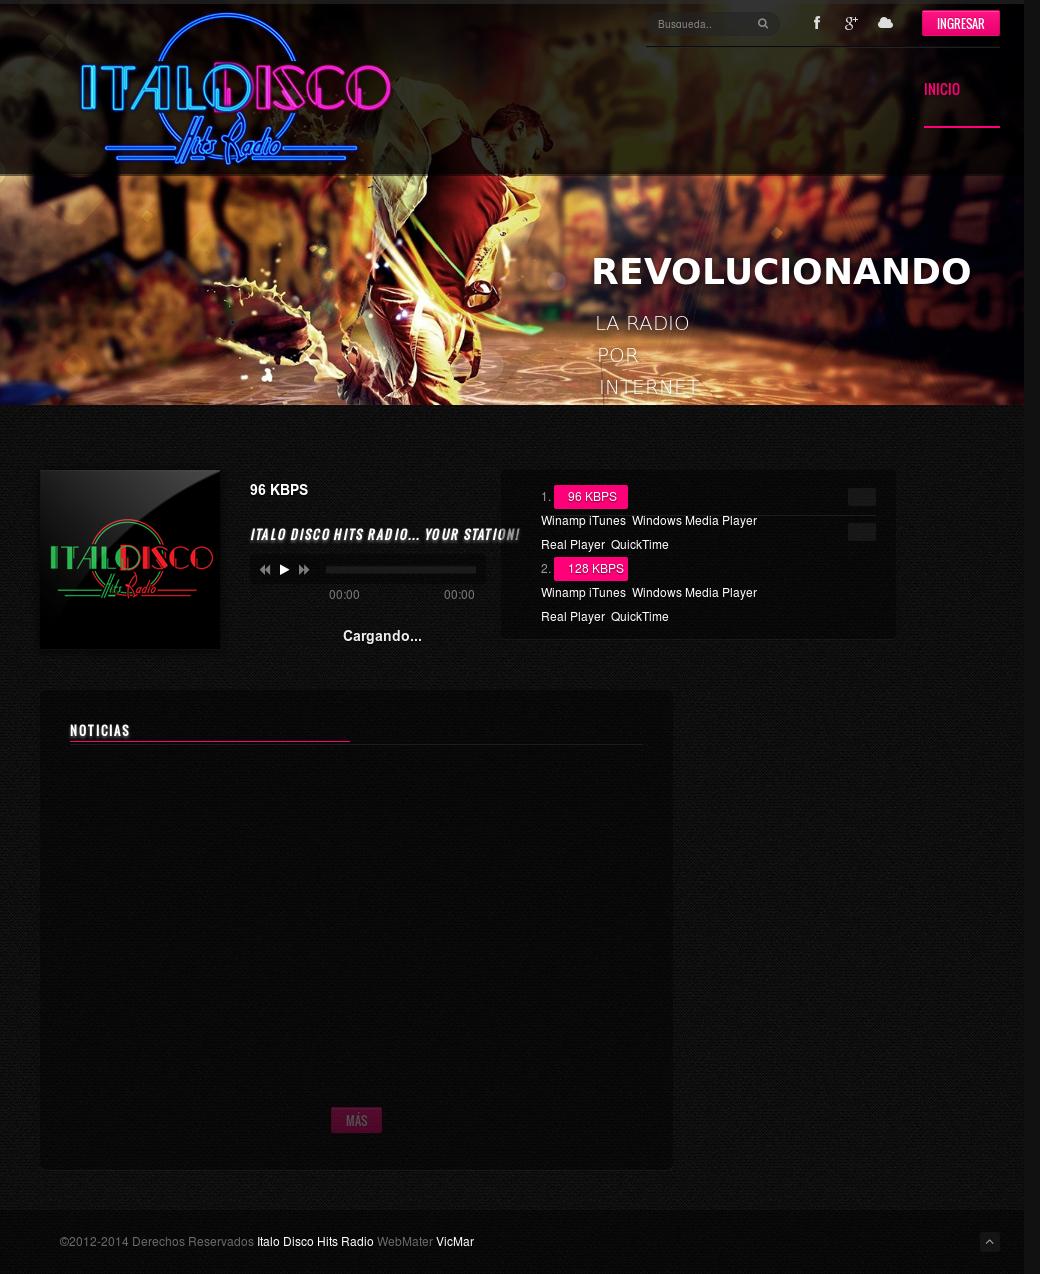 Italo Disco Hits Radio Competitors, Revenue and Employees